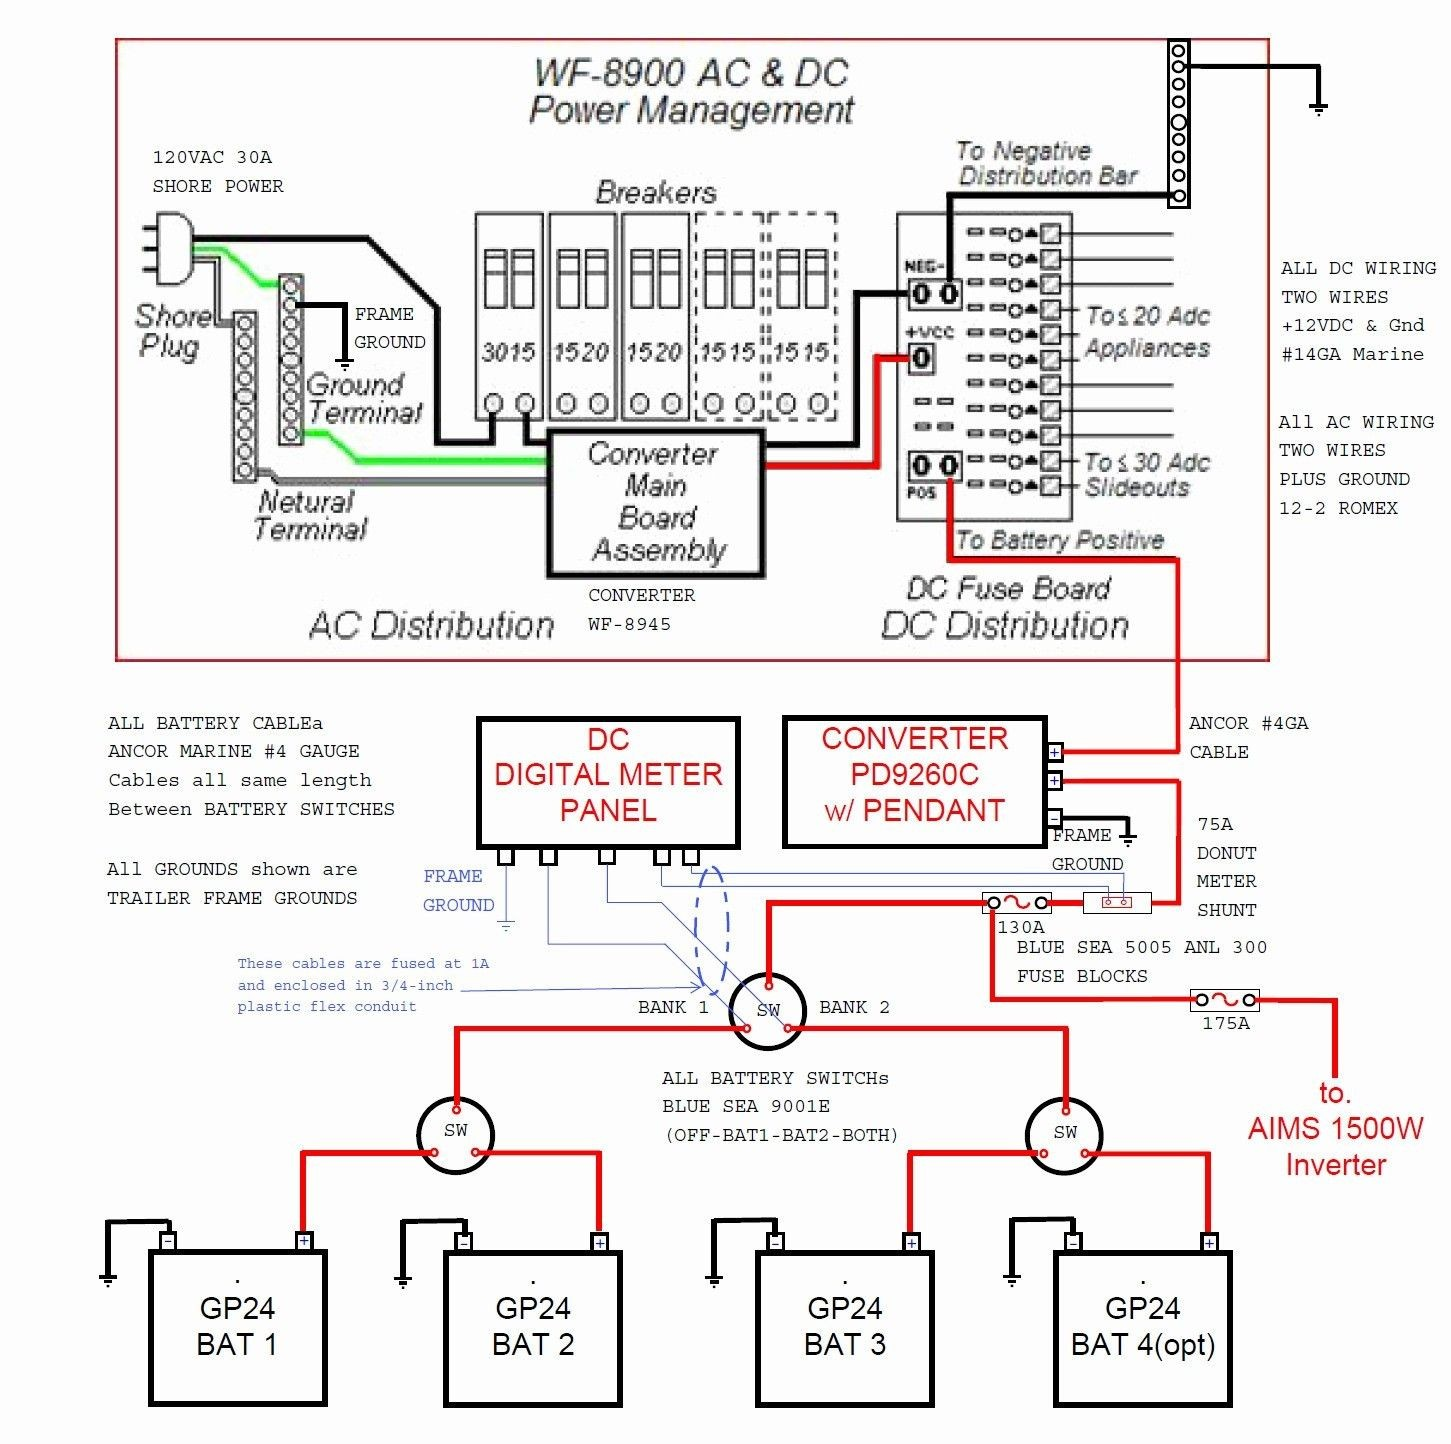 Bargman Breakaway Switch Instructions 7 Wire Rv Wiring Diagram Full Hd Version Wiring Diagram Of Bargman Breakaway Switch Instructions